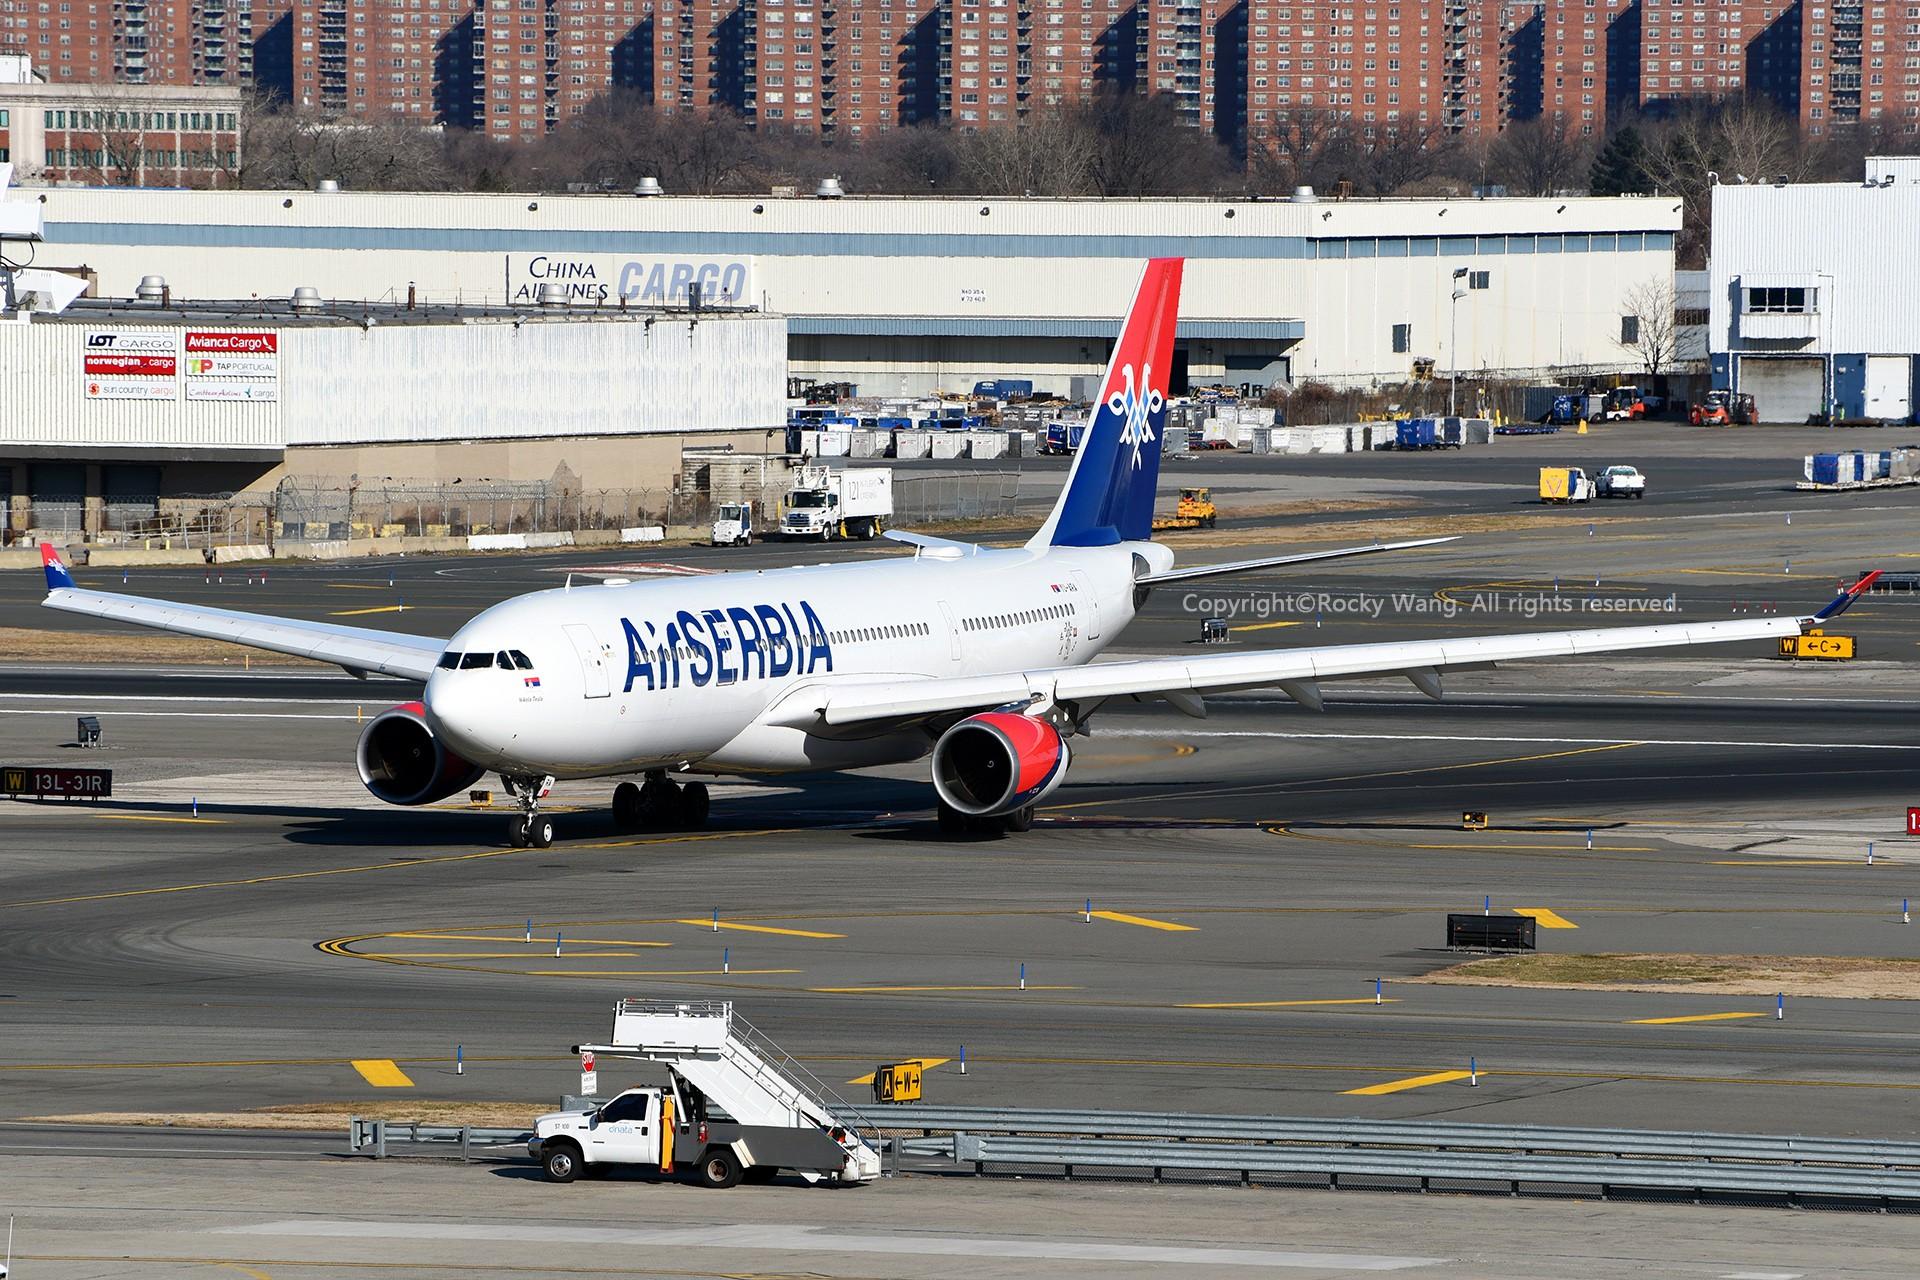 Re:[原创]A330s Around the World AIRBUS A330-202 YU-ARA 美国纽约约翰·菲茨杰拉德·肯尼迪国际机场